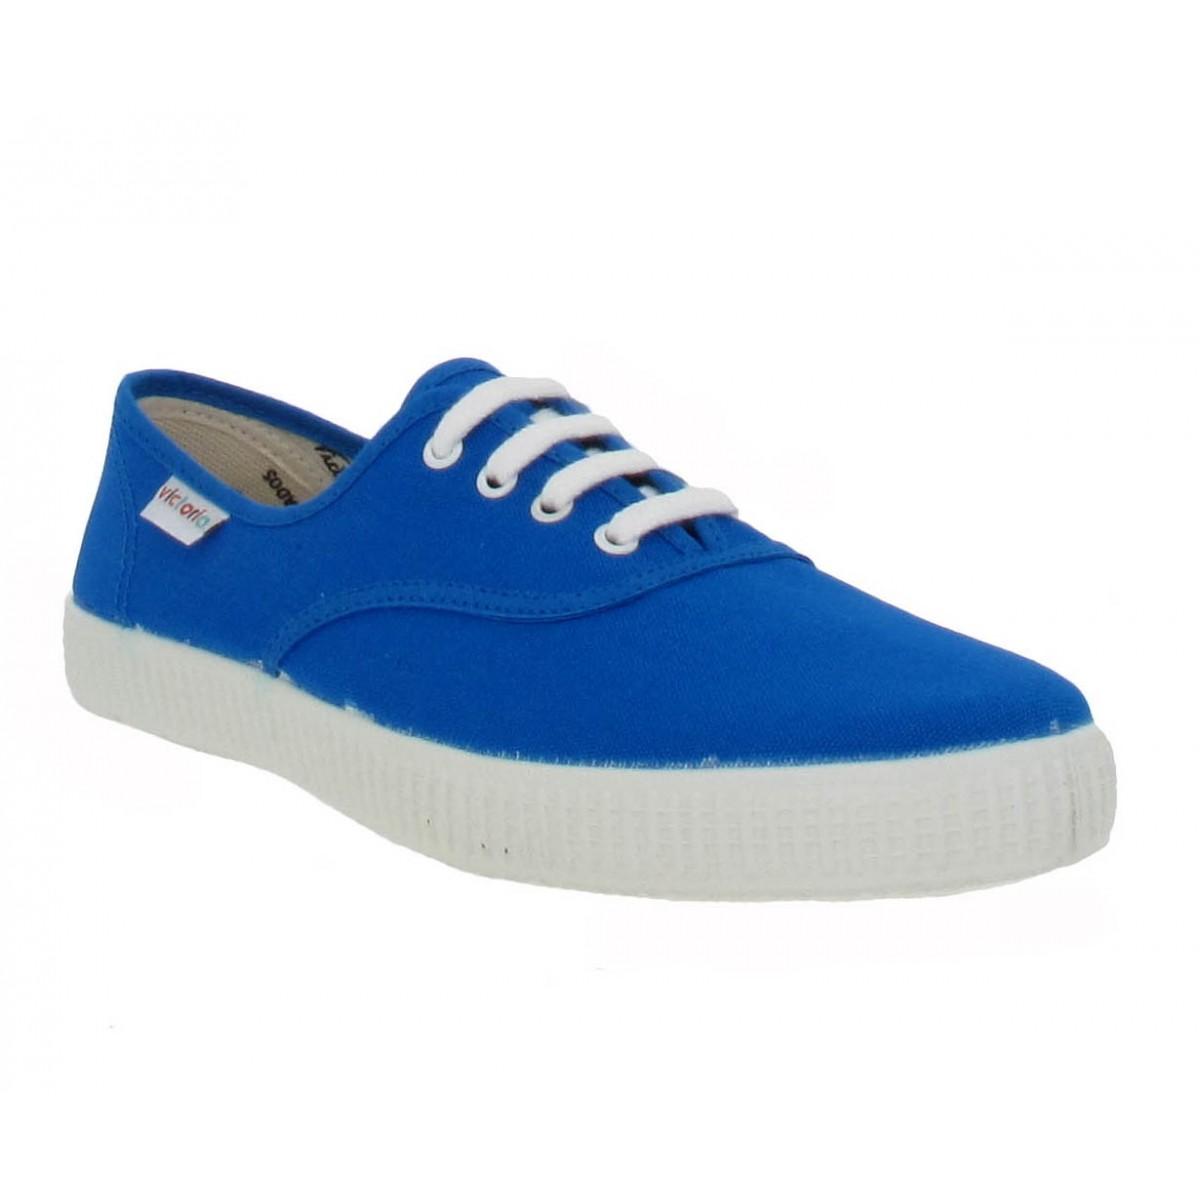 Baskets VICTORIA 6613 toile Homme Bleu